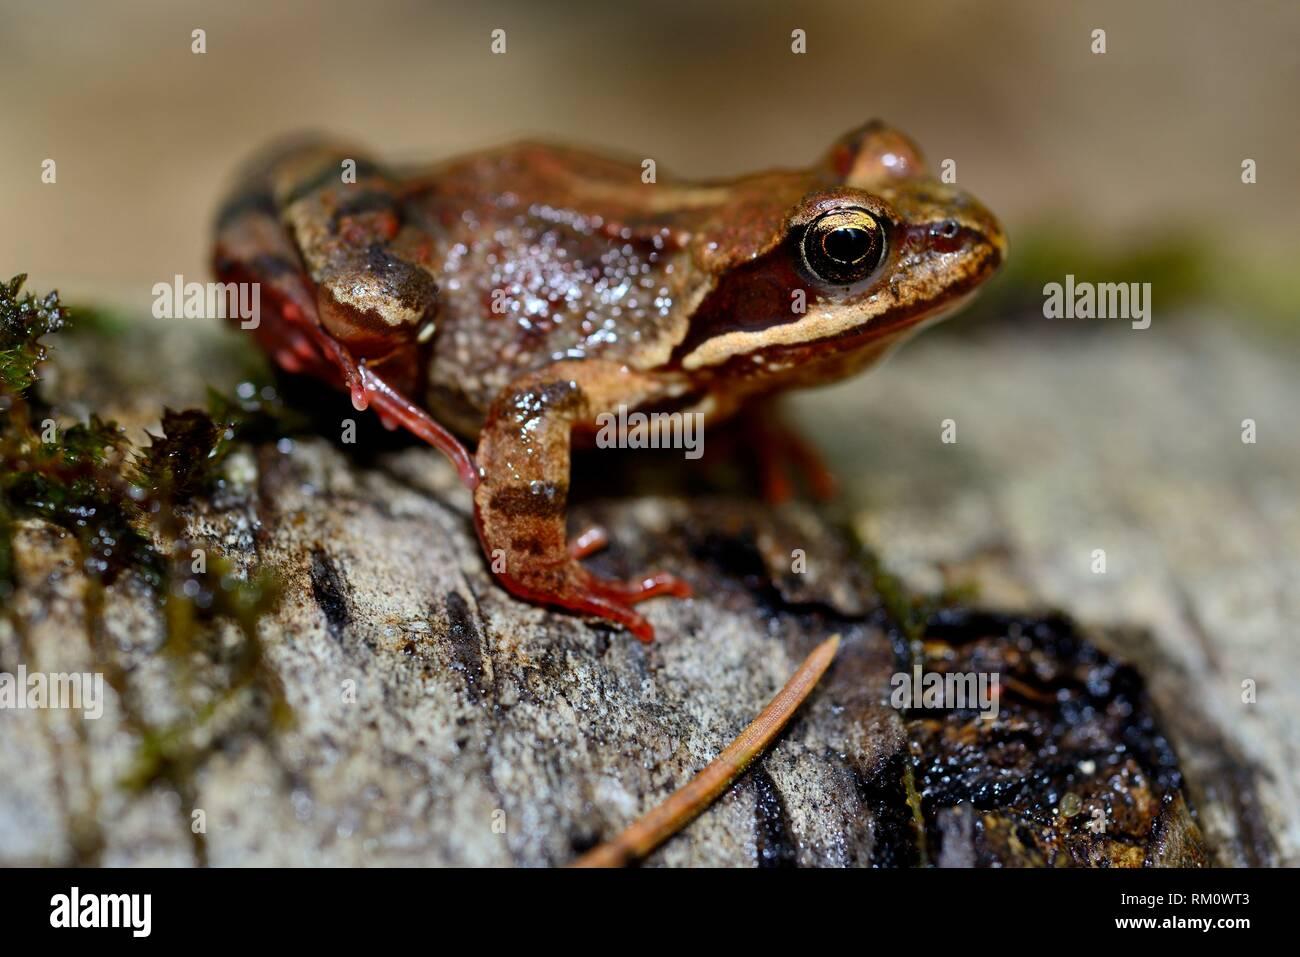 Common frog (Rana temporaria) in Bialowieza forest, Podlasie, Poland. - Stock Image